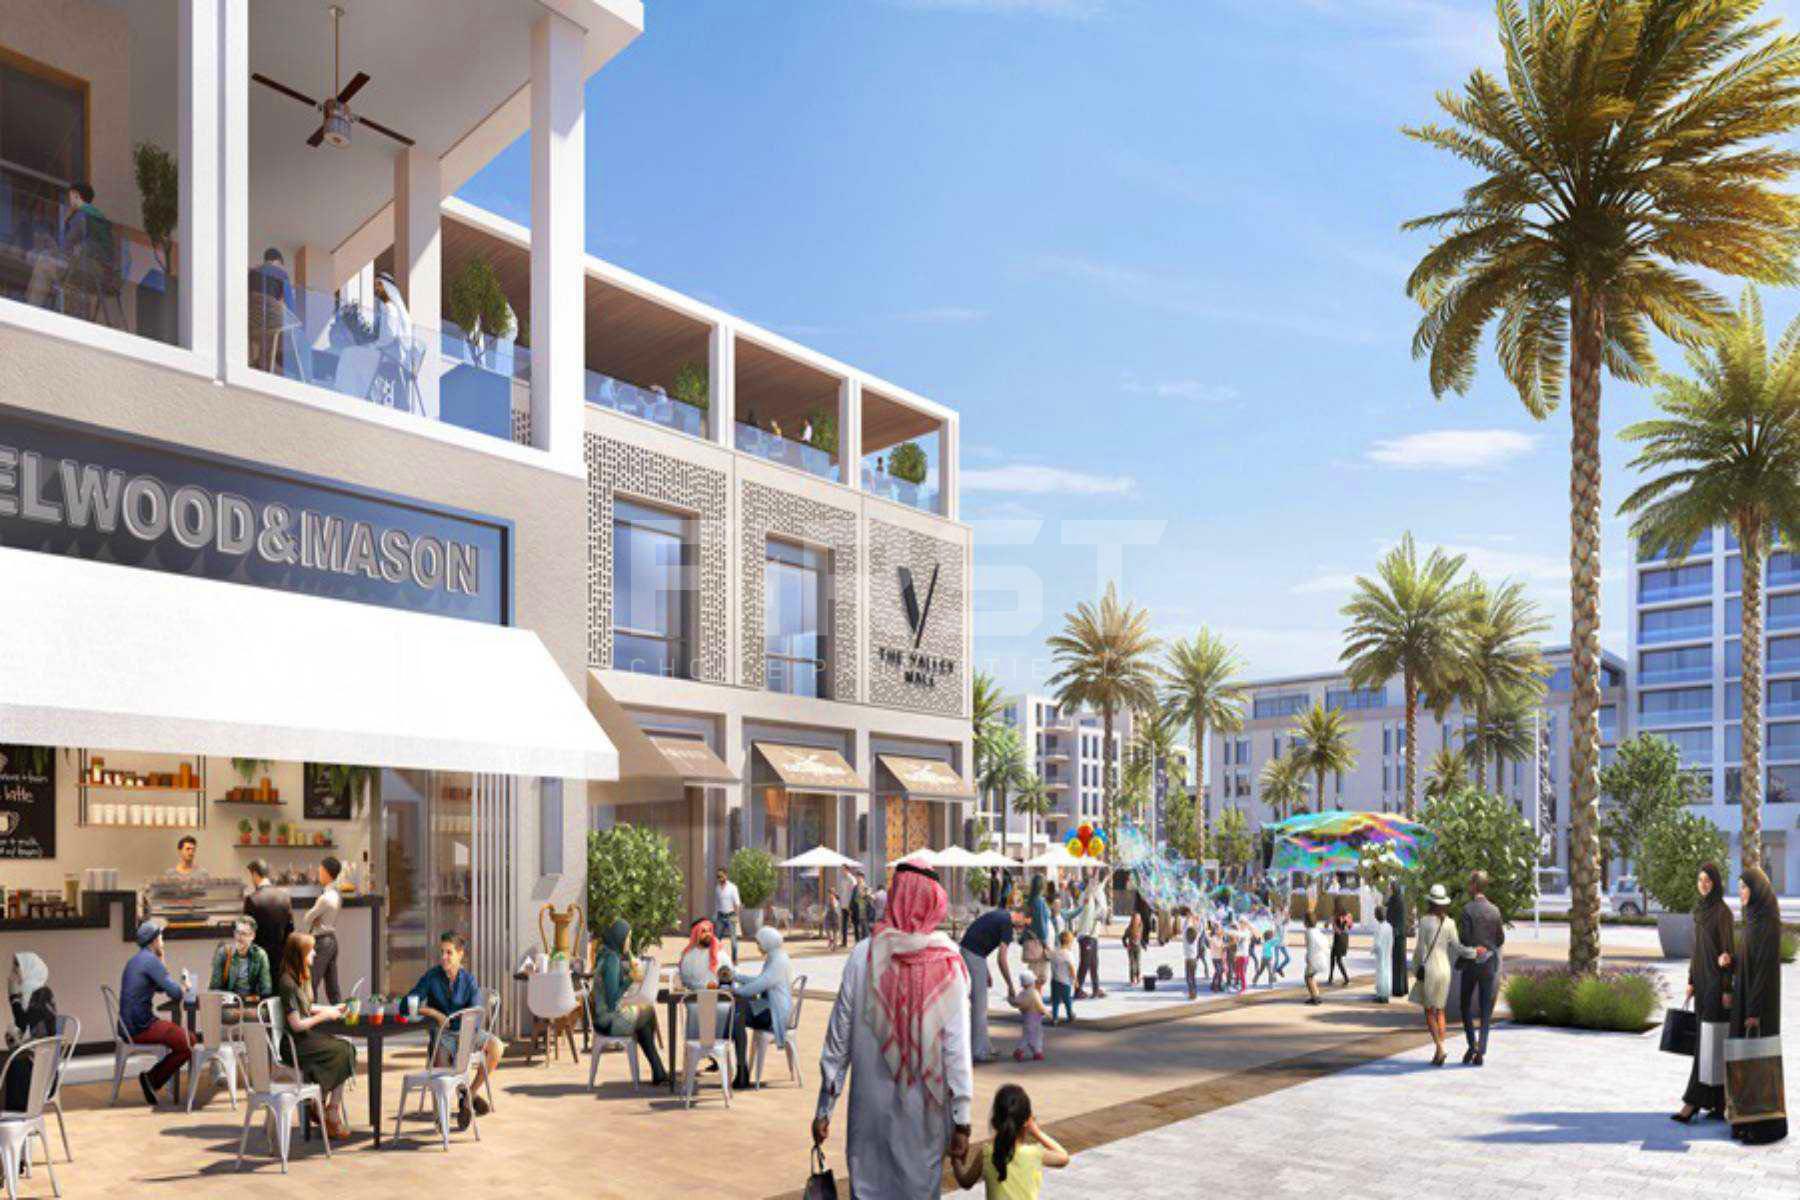 External Photos of The Valley in Dubai  Land, Dubai - UAE (2).jpg